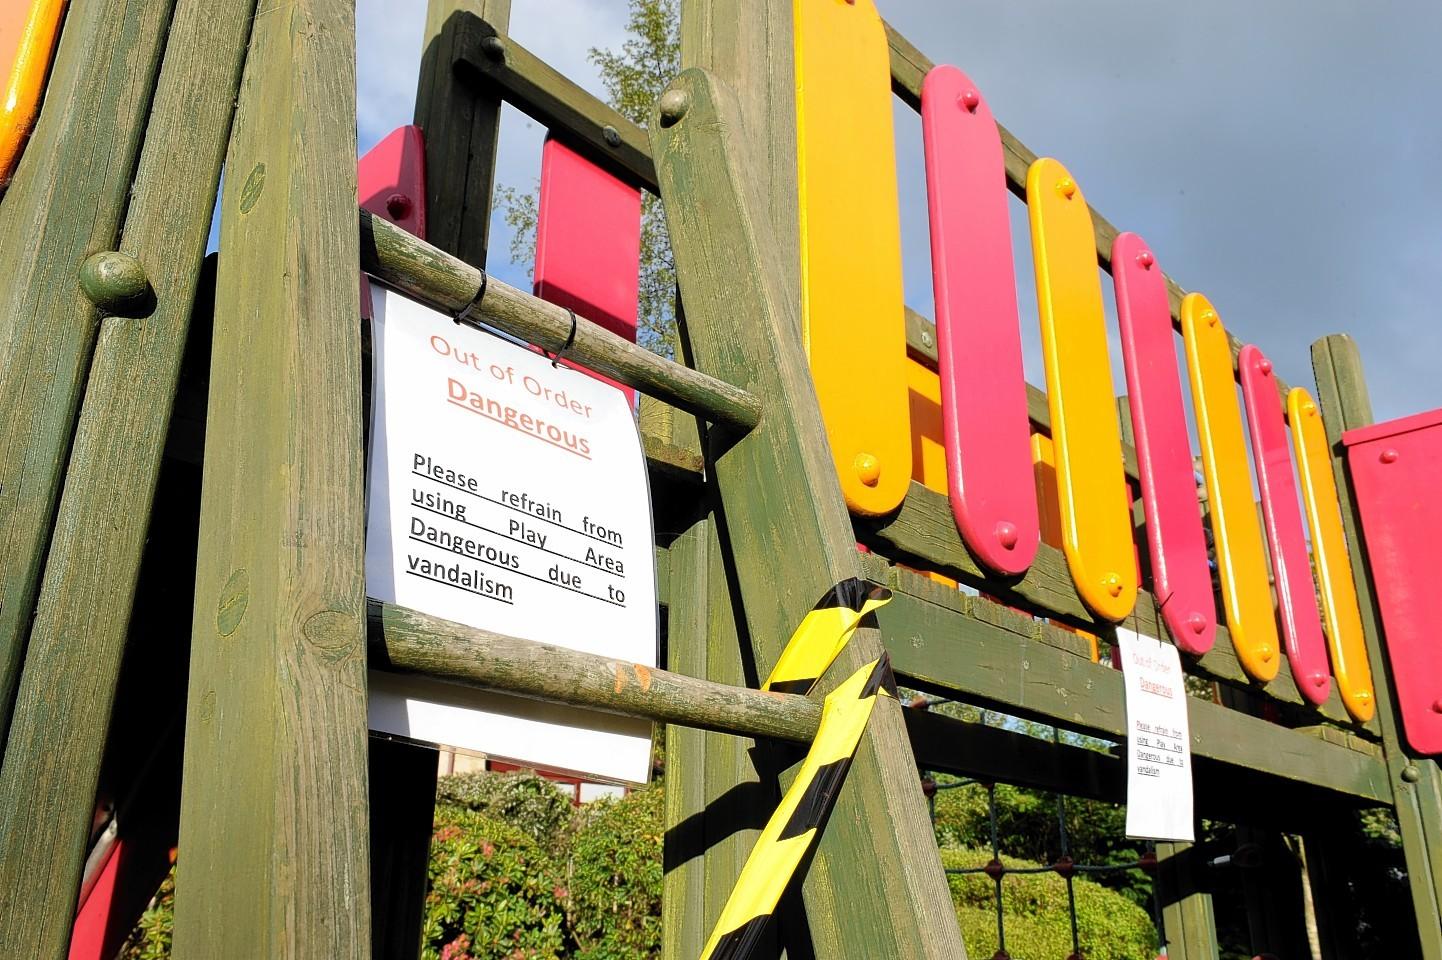 The children's play area in Bieldside